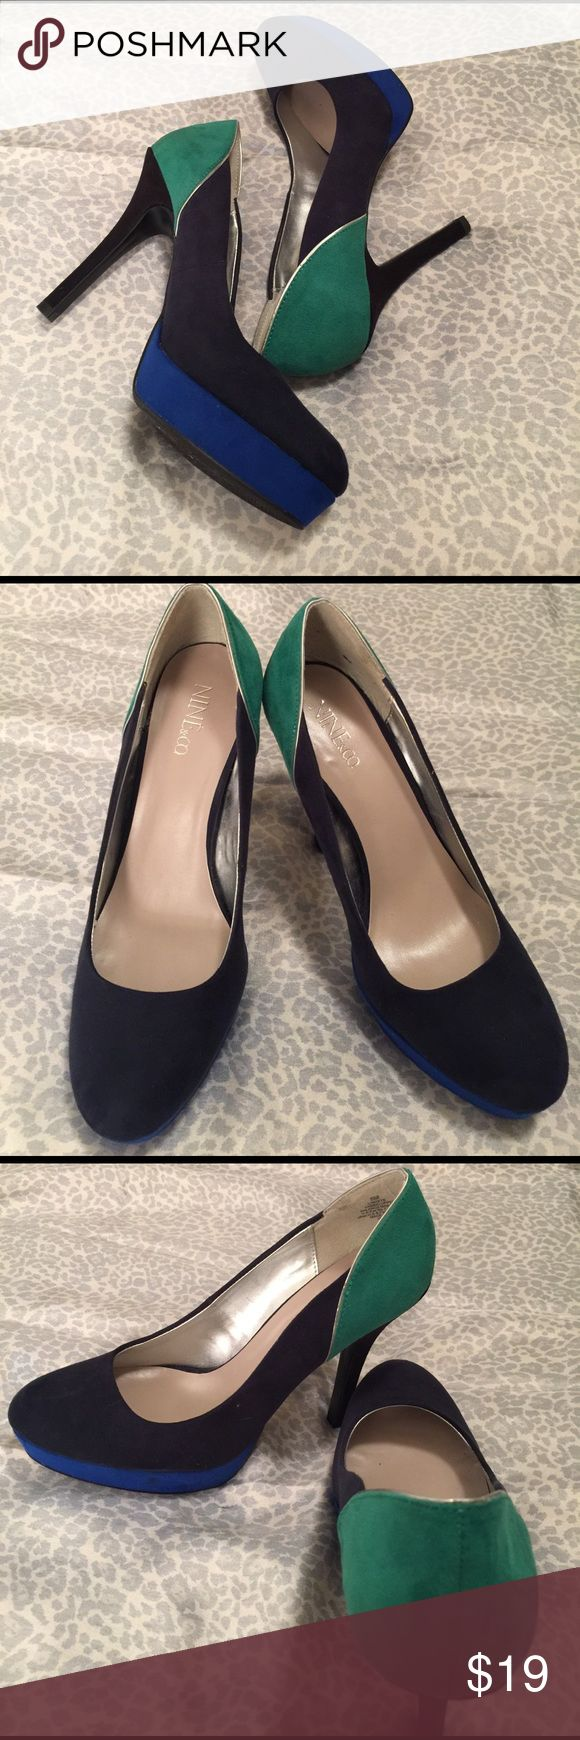 "Nine & Co. Navy Suede Multi Color high heel Suede 4"" multi color heels - navy upper, green back, blue wedge and black heel - worn once! Nine & Co. Shoes Heels"